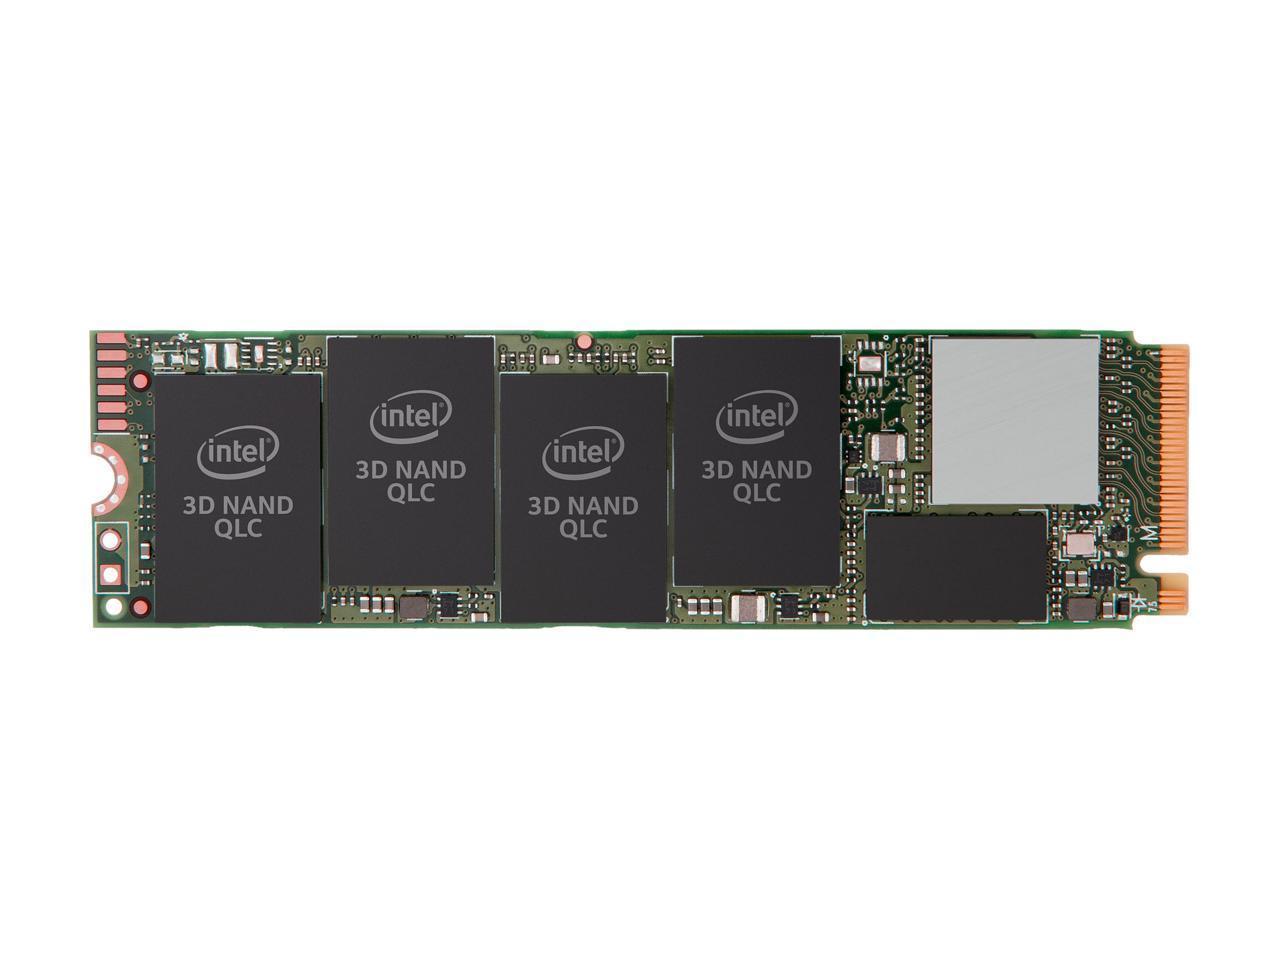 Solid State Drive (SSD) Intel 660P 2 TB NVMe M.2 2280 PCIe 3.0 x4 QLC-2